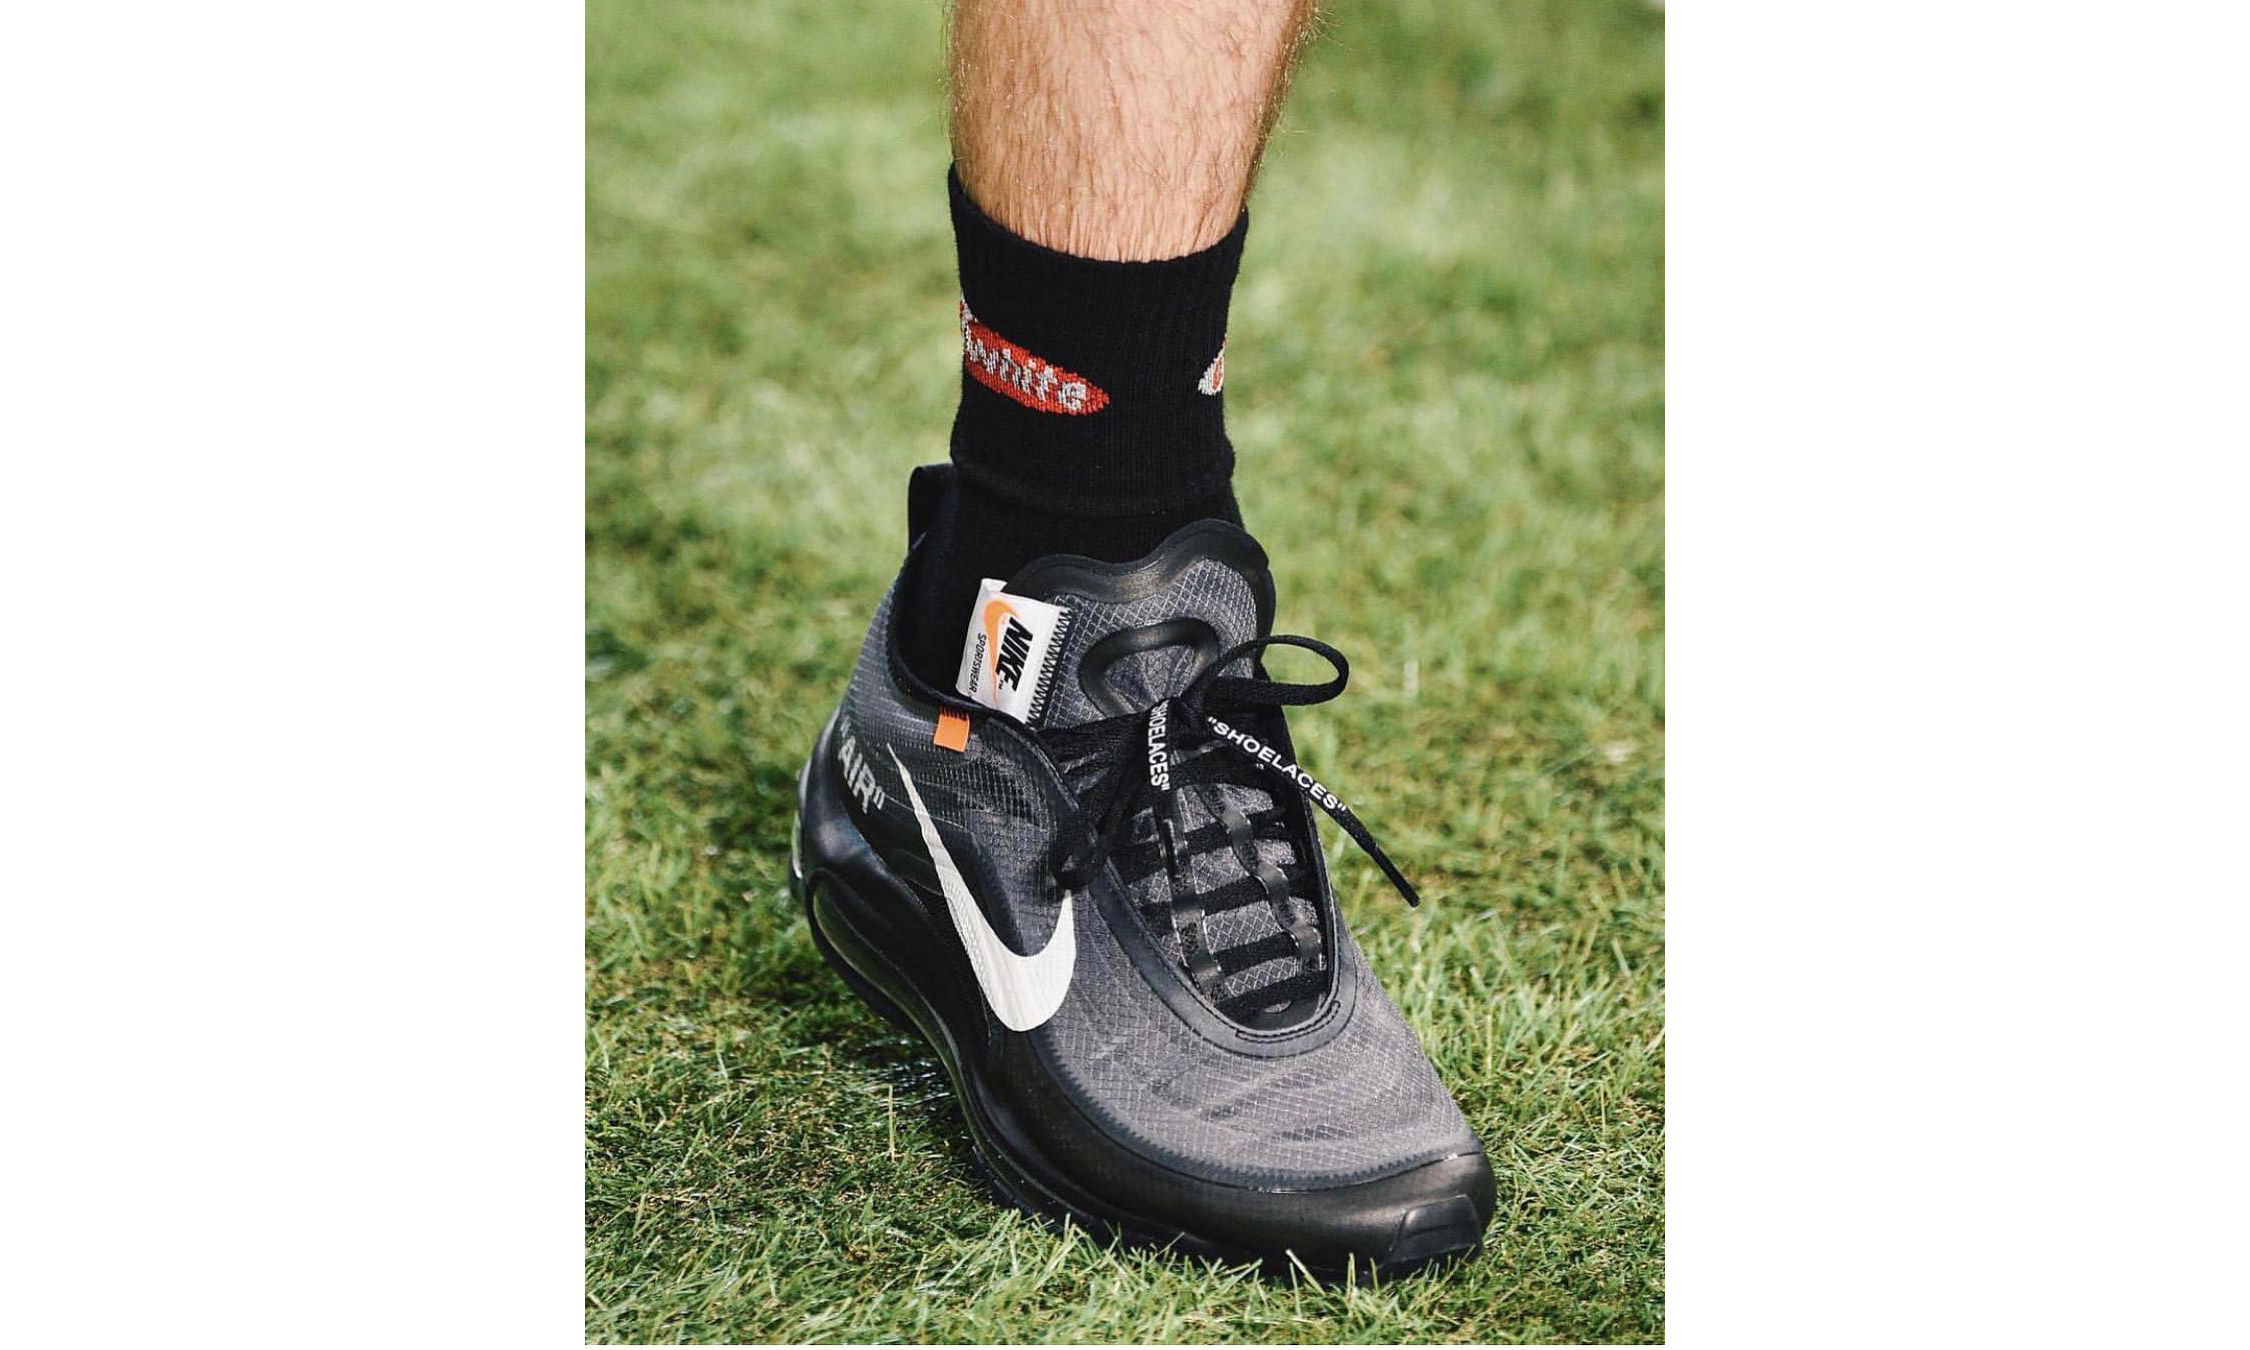 Virgil Abloh x NikeLab Air Max 97 发售日期即将到来?